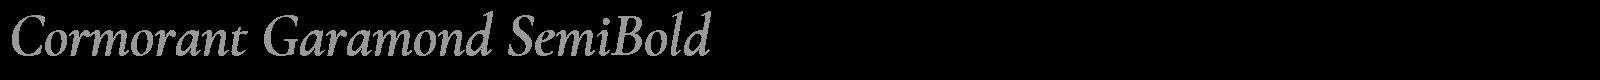 Download Free Font Cormorant Garamond